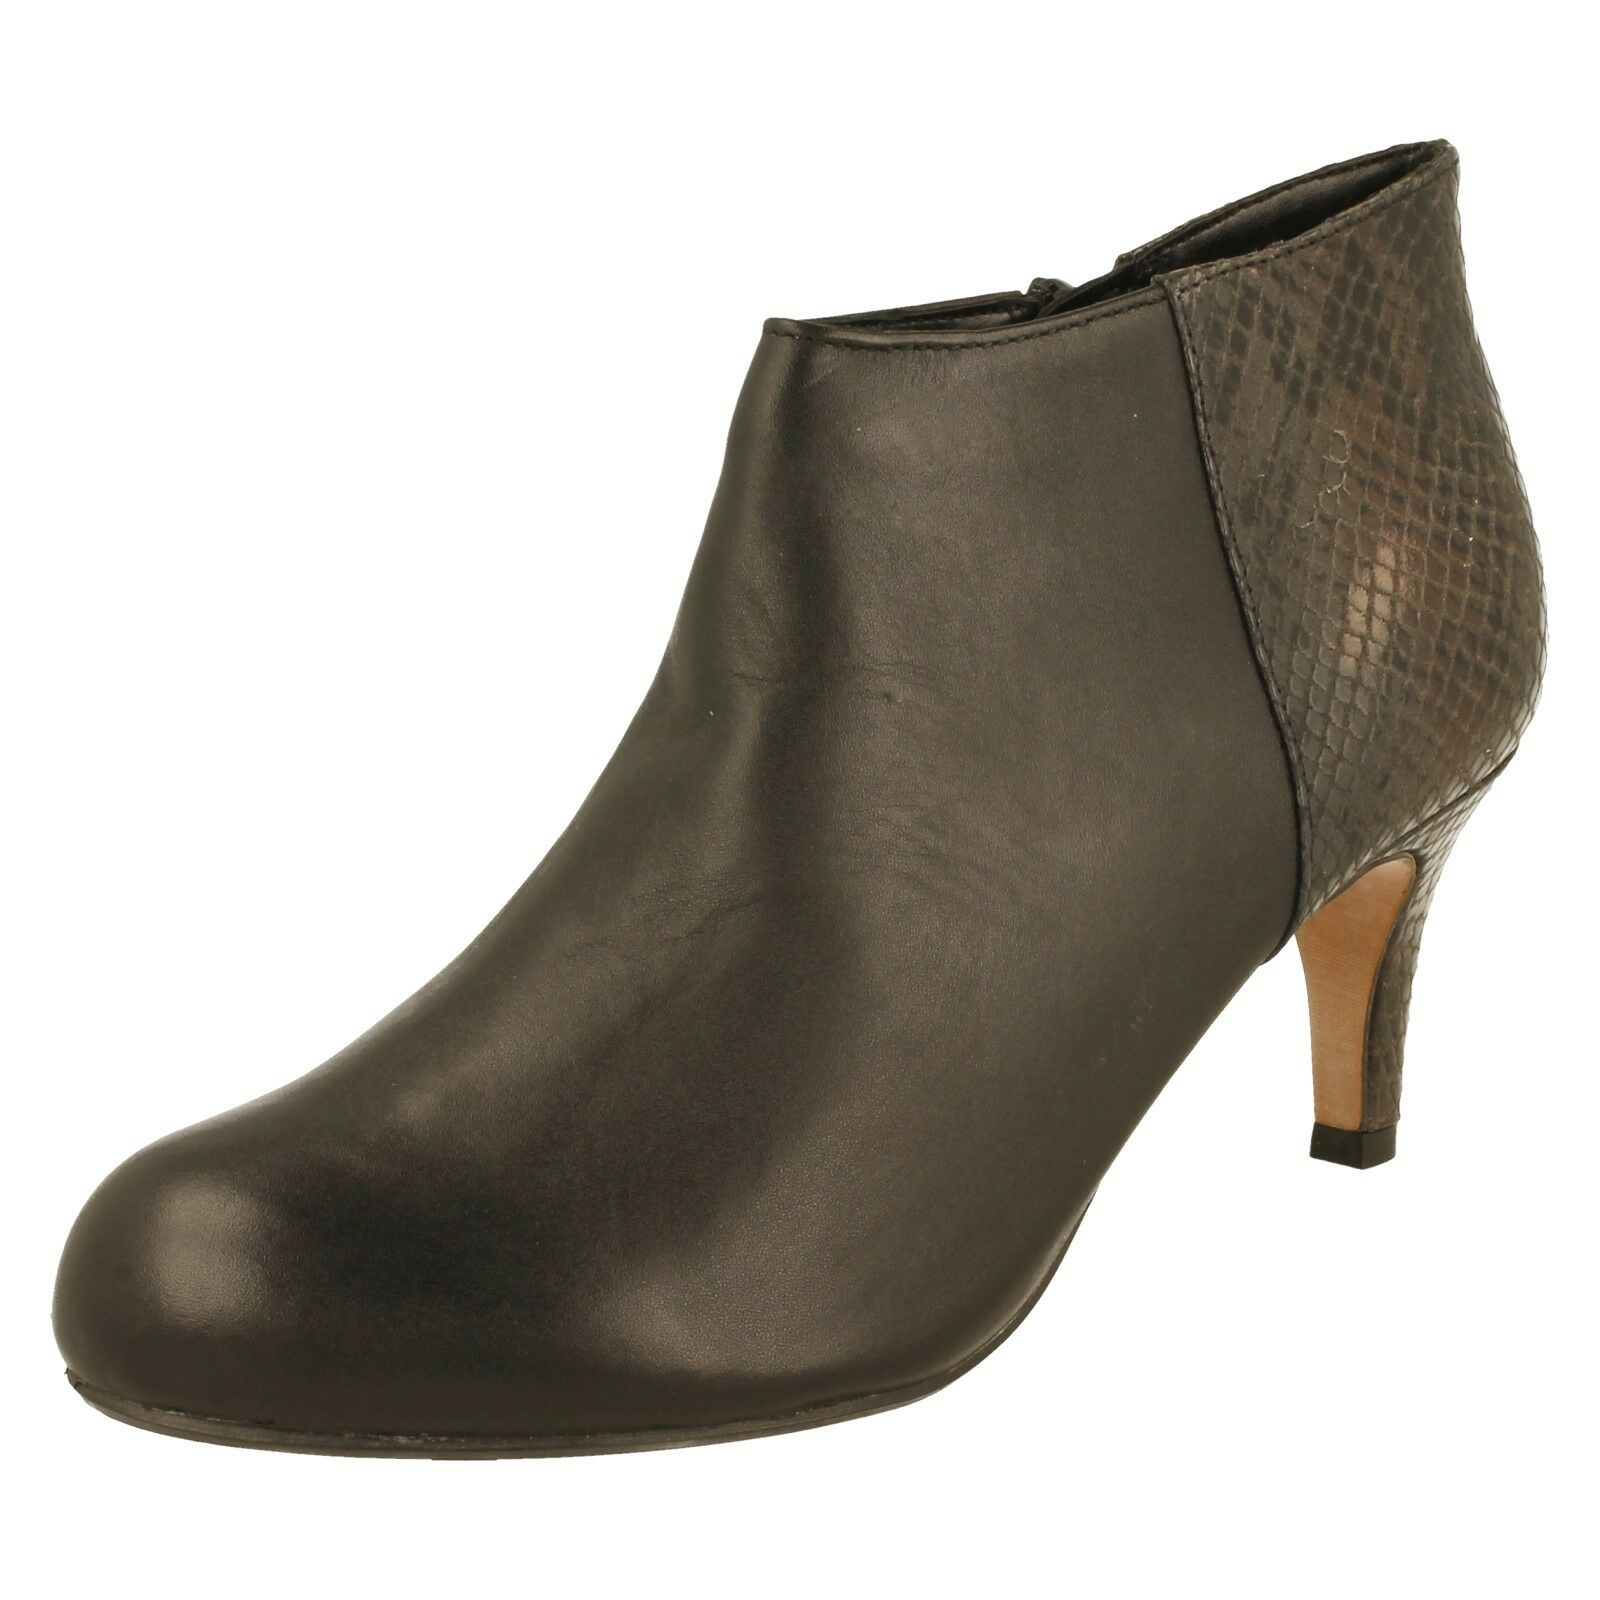 Damas Clarks Tacón Alto Pantalones Boot-Arista Flirt 4